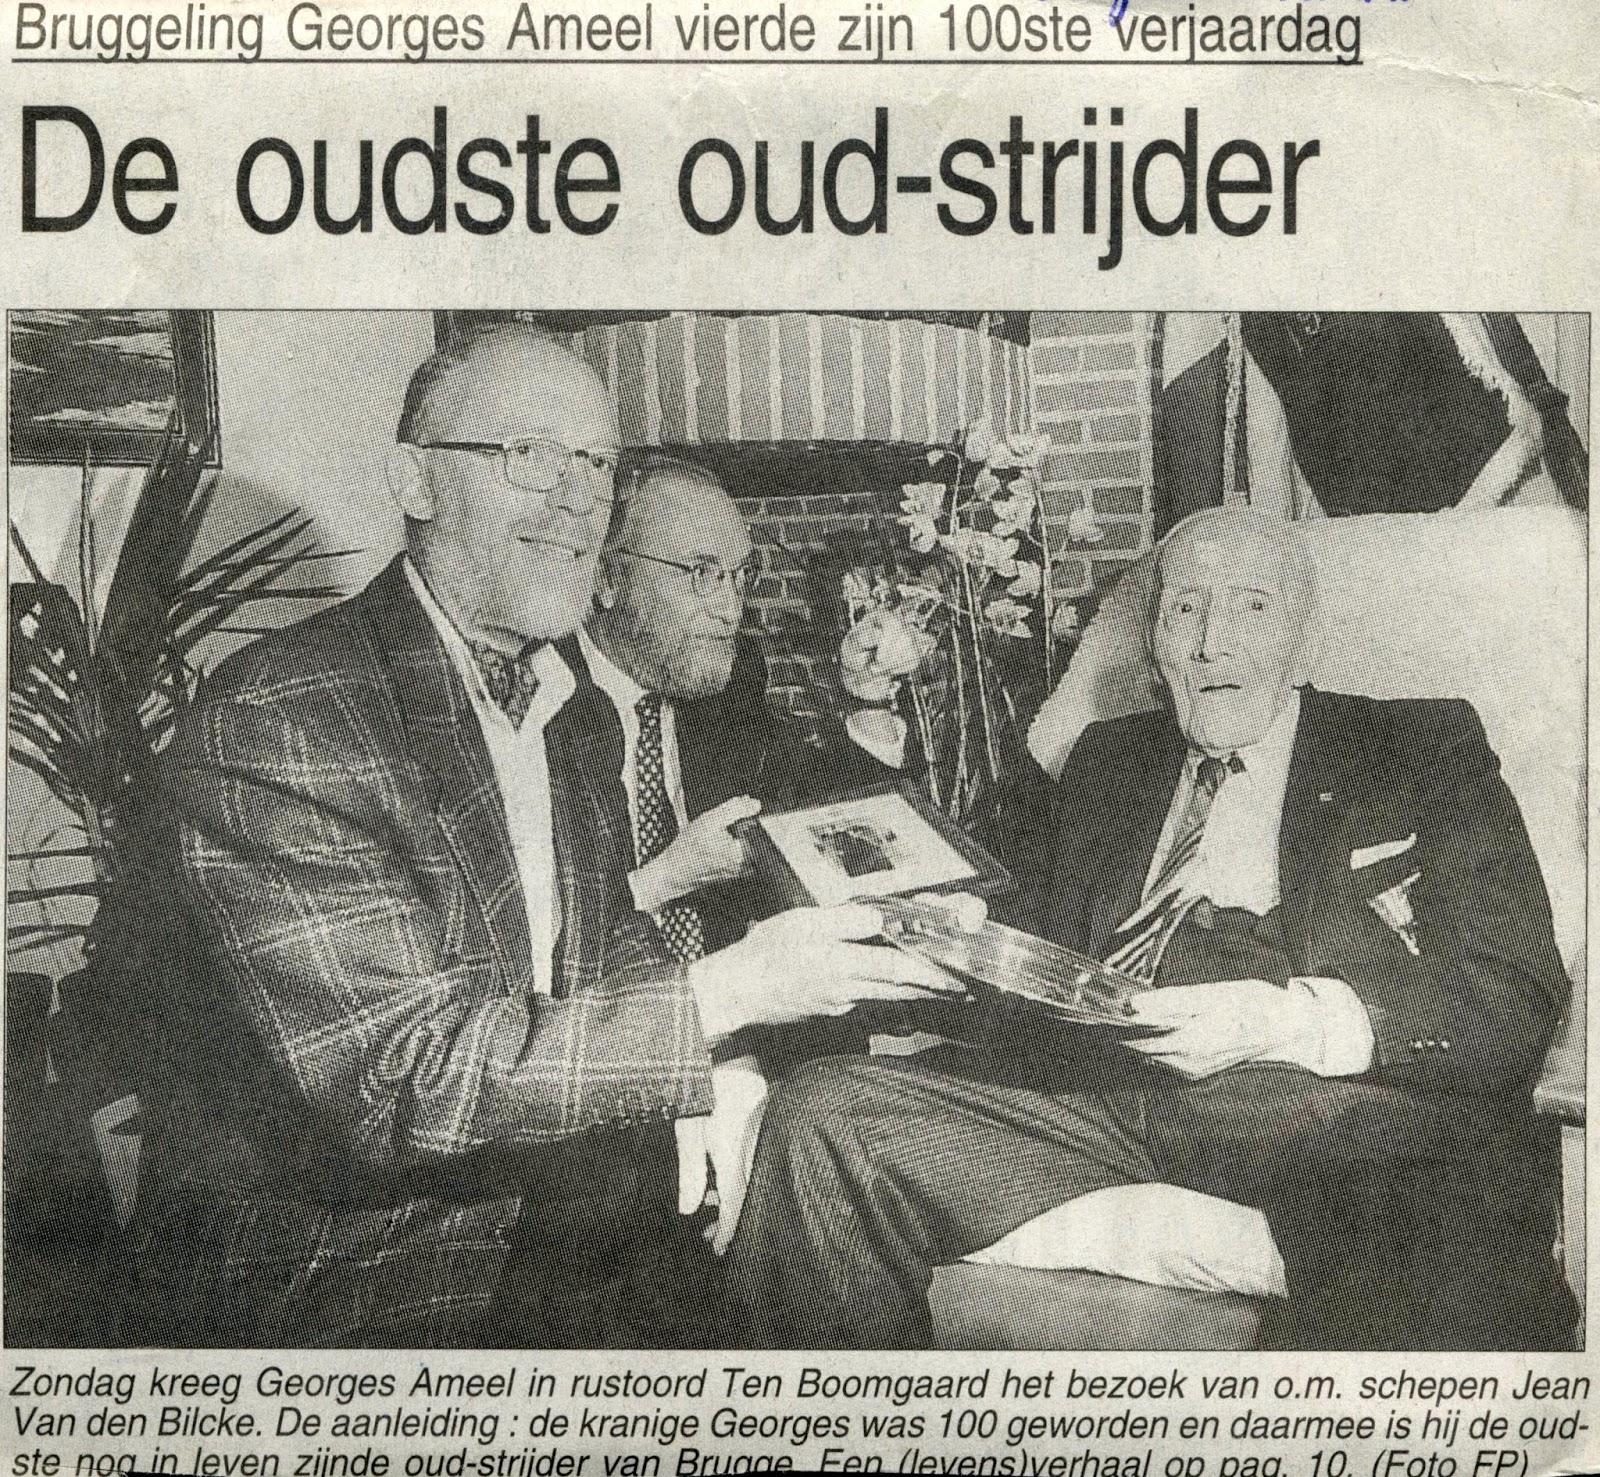 Georges gevierd als honderdjarige. Brugsch Handelsblad 27-01-1996